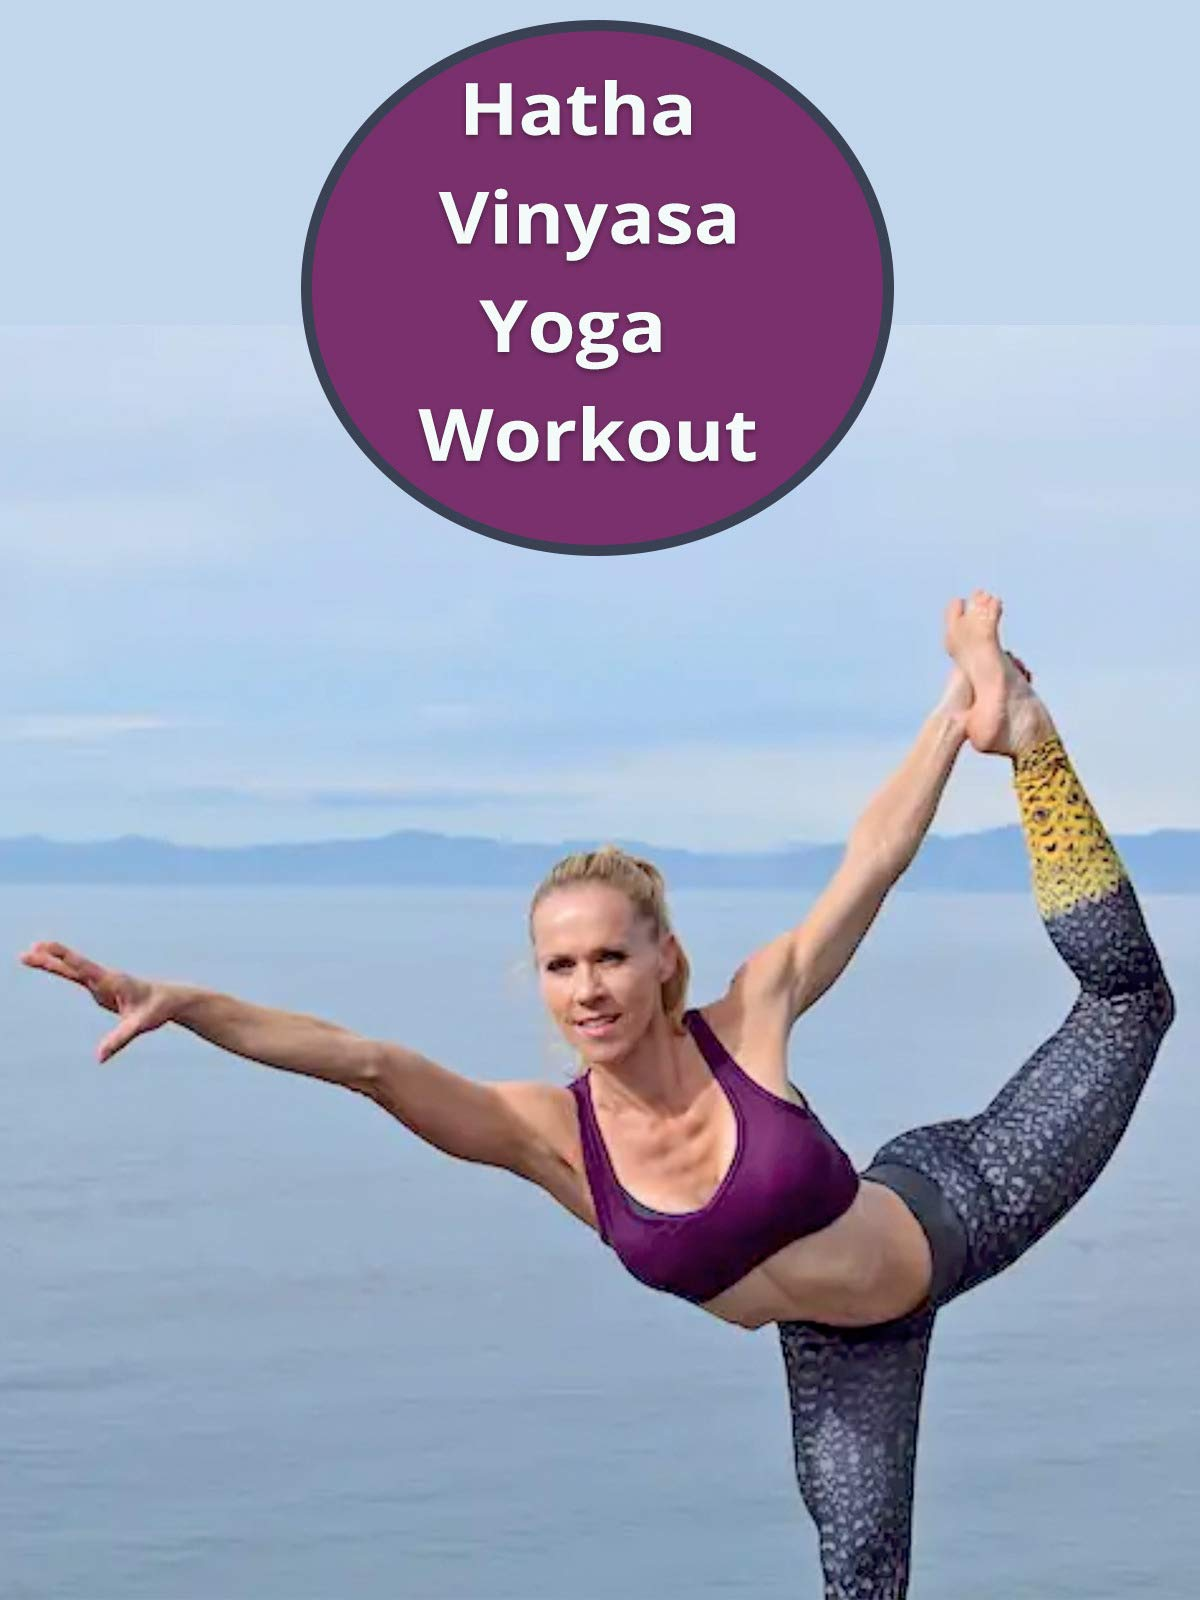 Hatha Vinyasa Yoga Workout